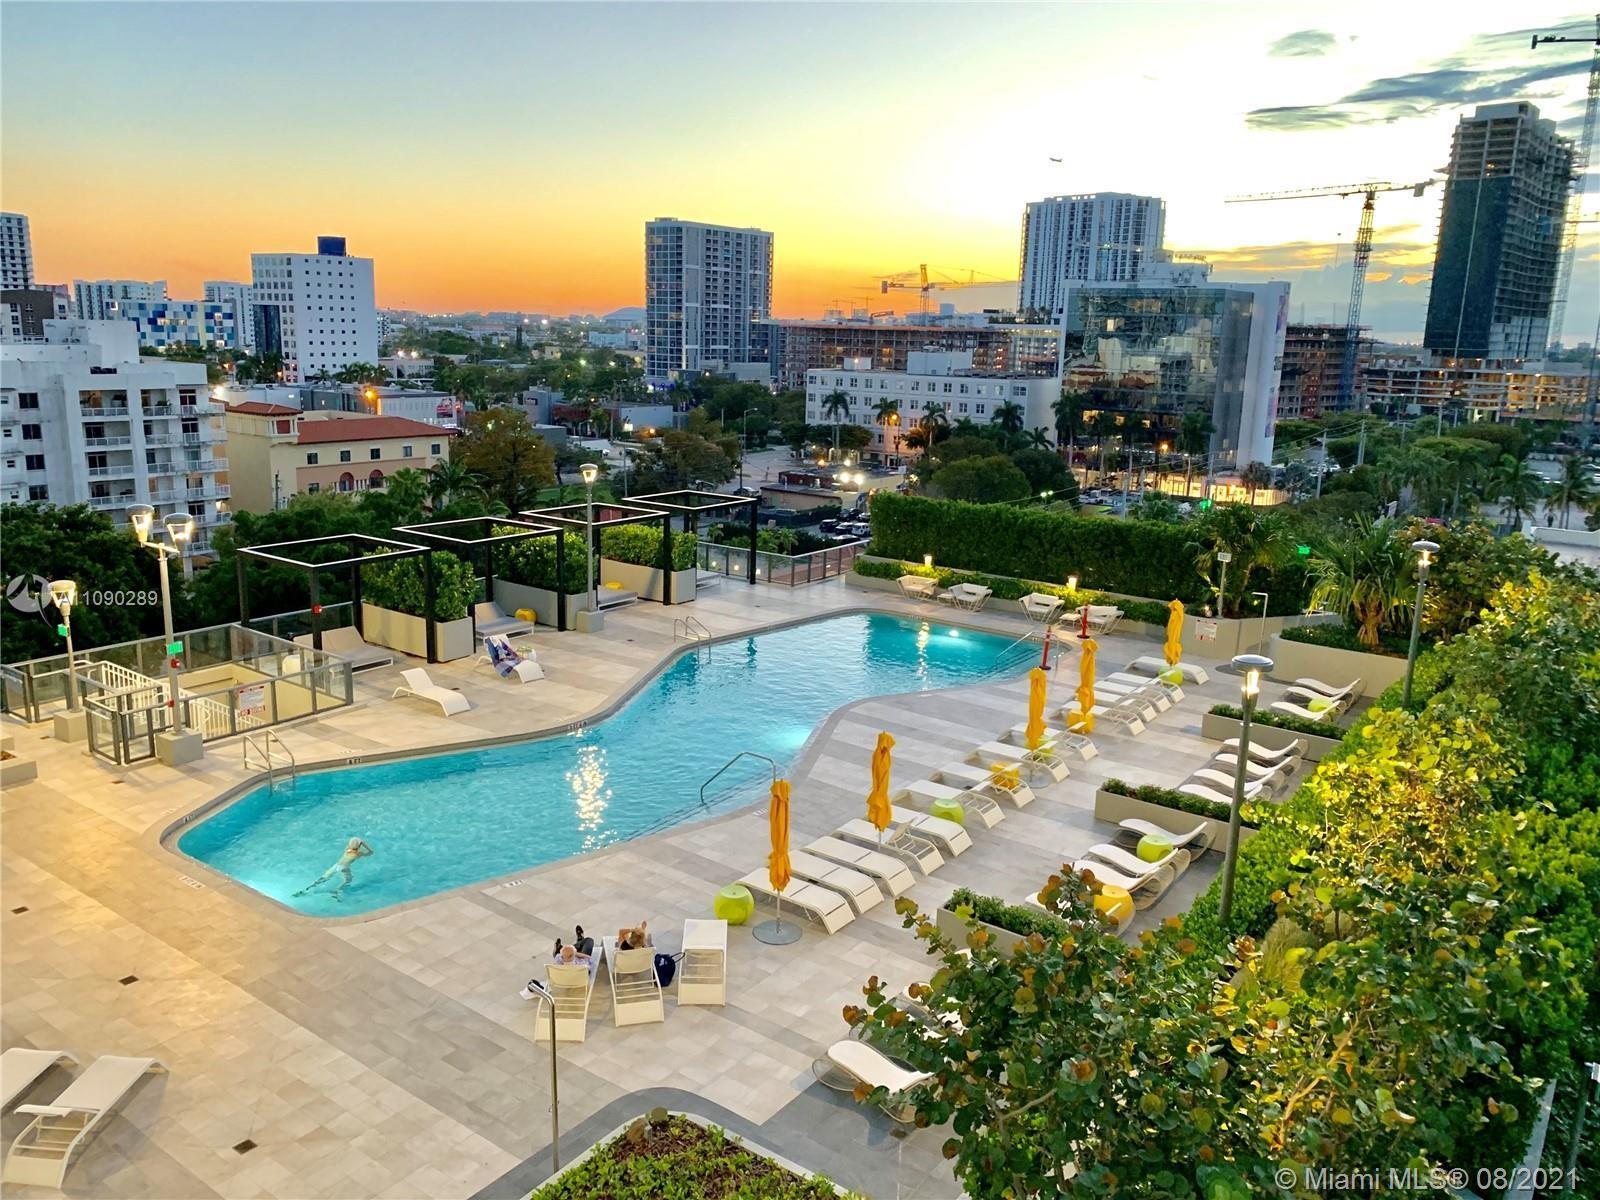 Paraiso Bayviews #2308 - 501 NE 31st St #2308, Miami, FL 33137